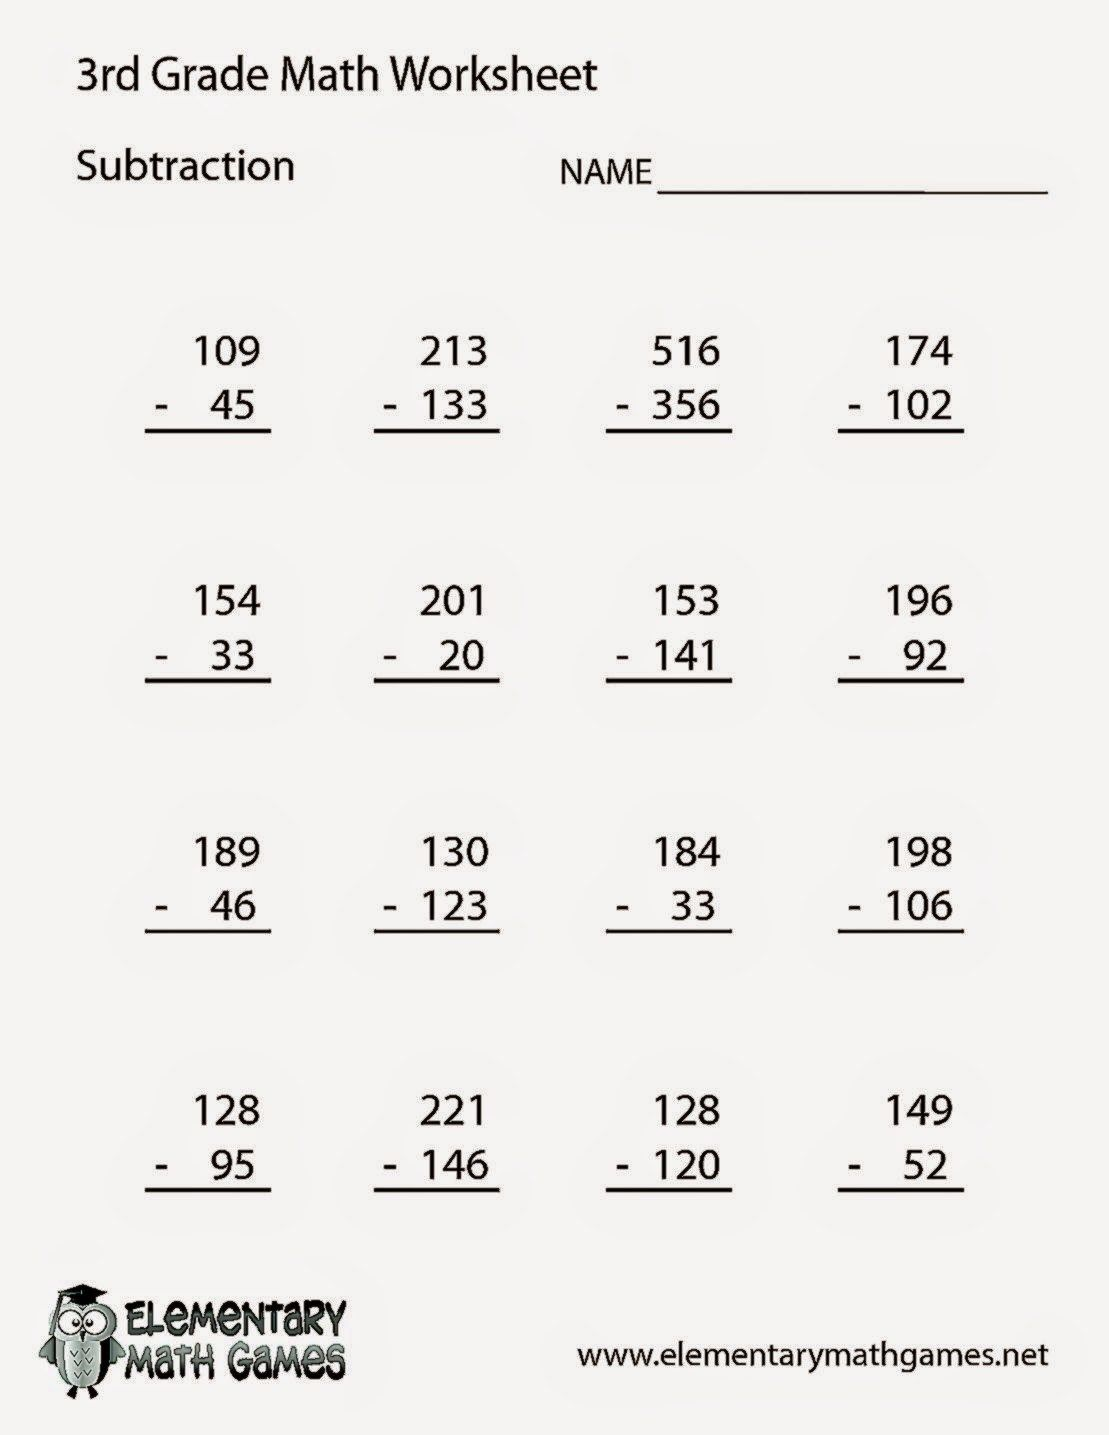 7th Grade Math Homework Worksheet Printable Worksheets And   3rd grade math  worksheets [ 1435 x 1109 Pixel ]